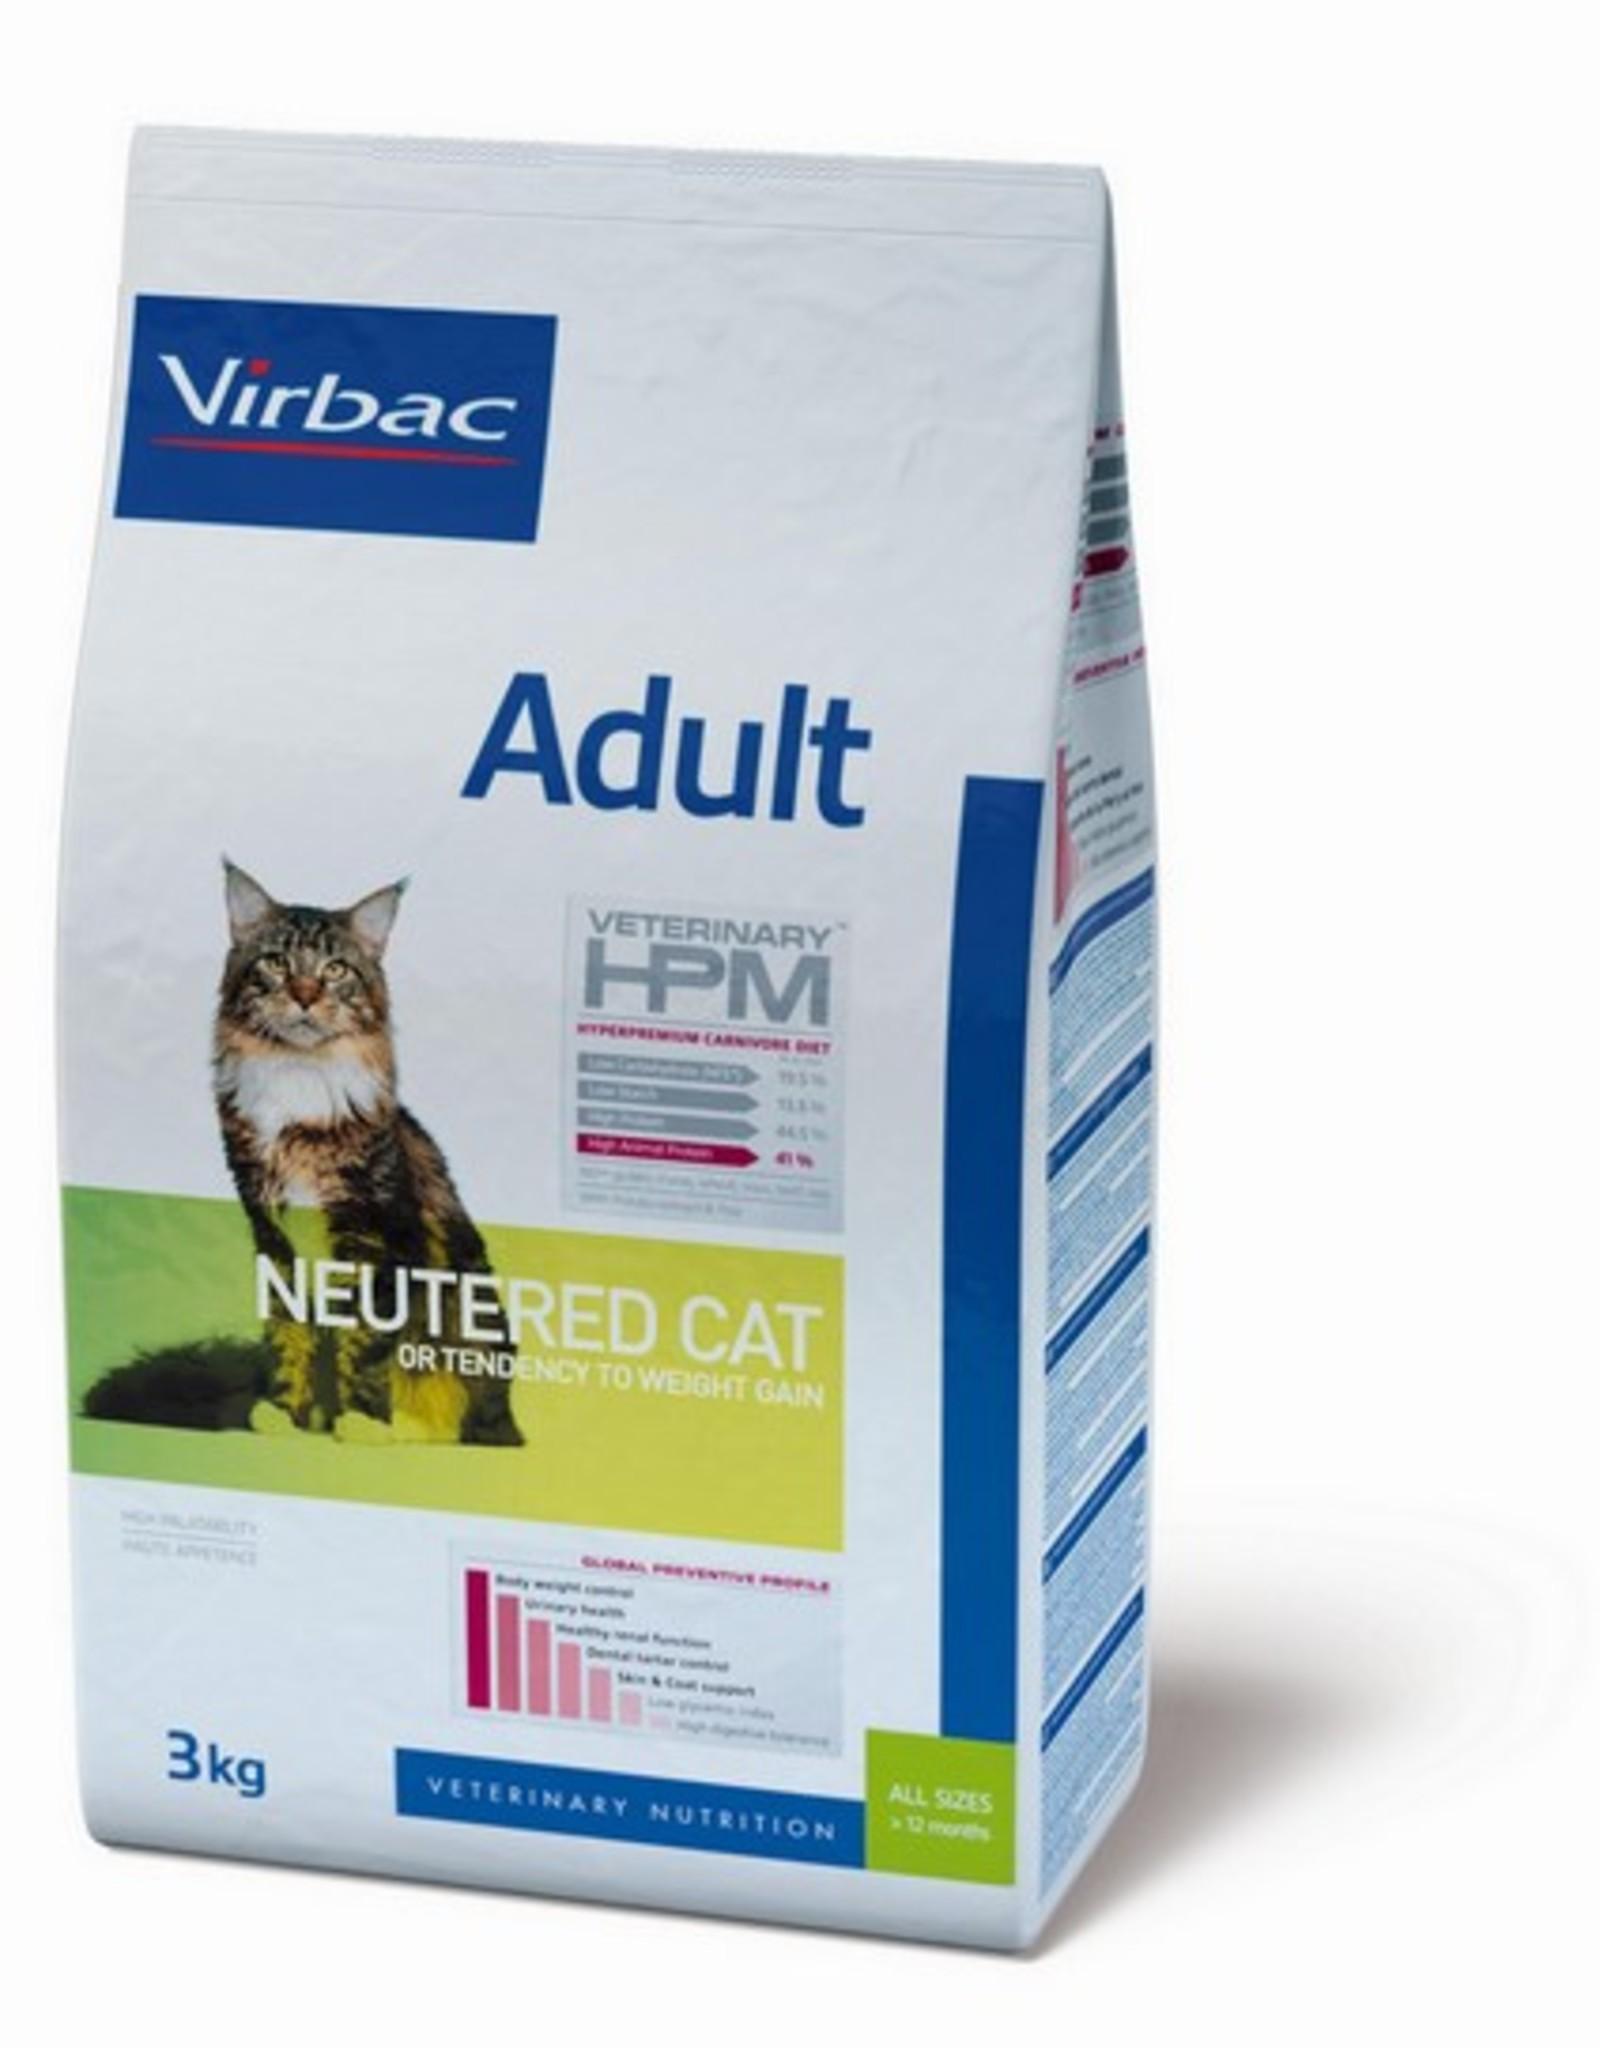 Virbac Virbac Hpm Cat Neutered Adult 3kg